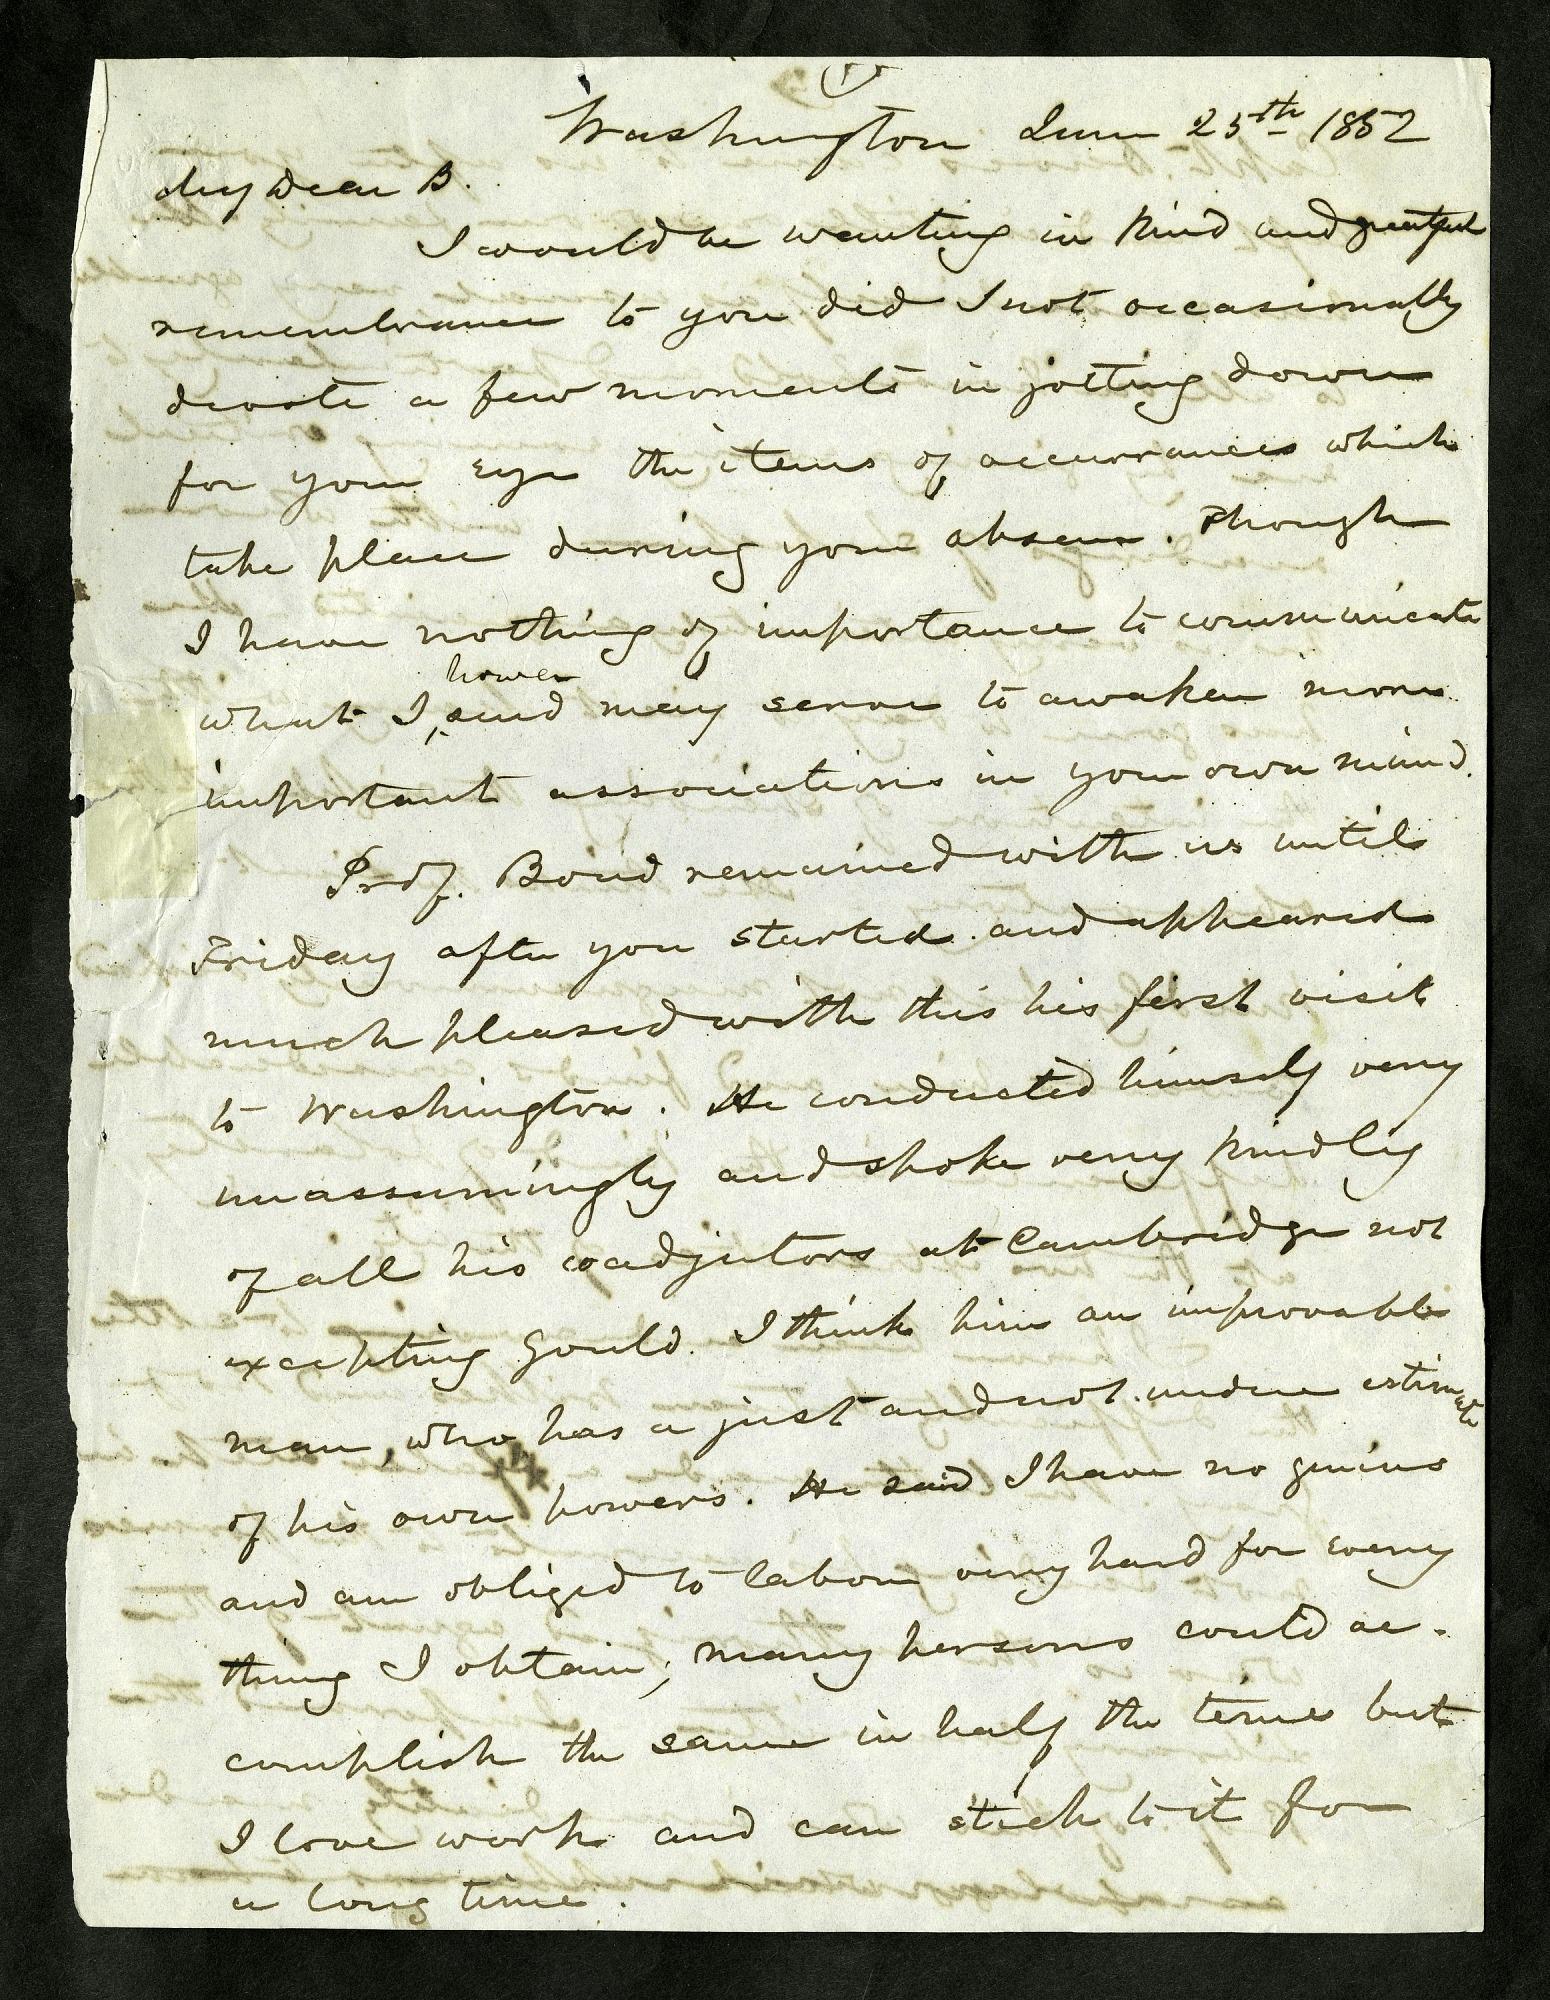 Joseph Henry's Letter to Alexander Dallas Bache (June 25 - July 9, 1852)